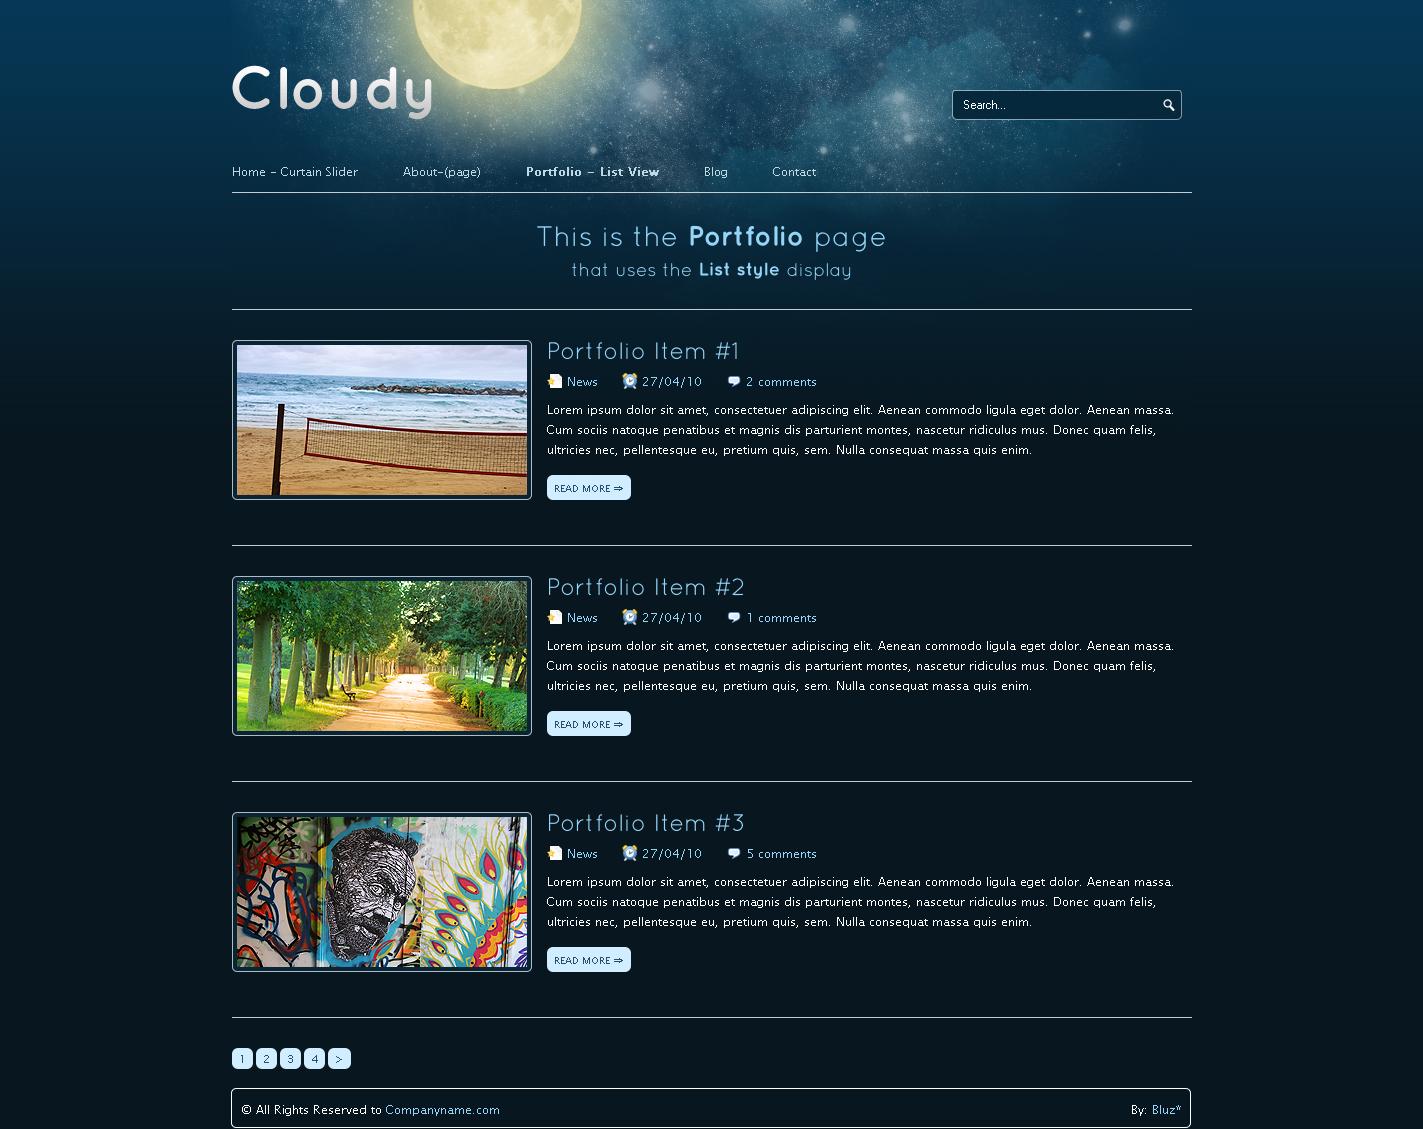 Cloudy-2 in 1 Unique Business & Portfolio Template